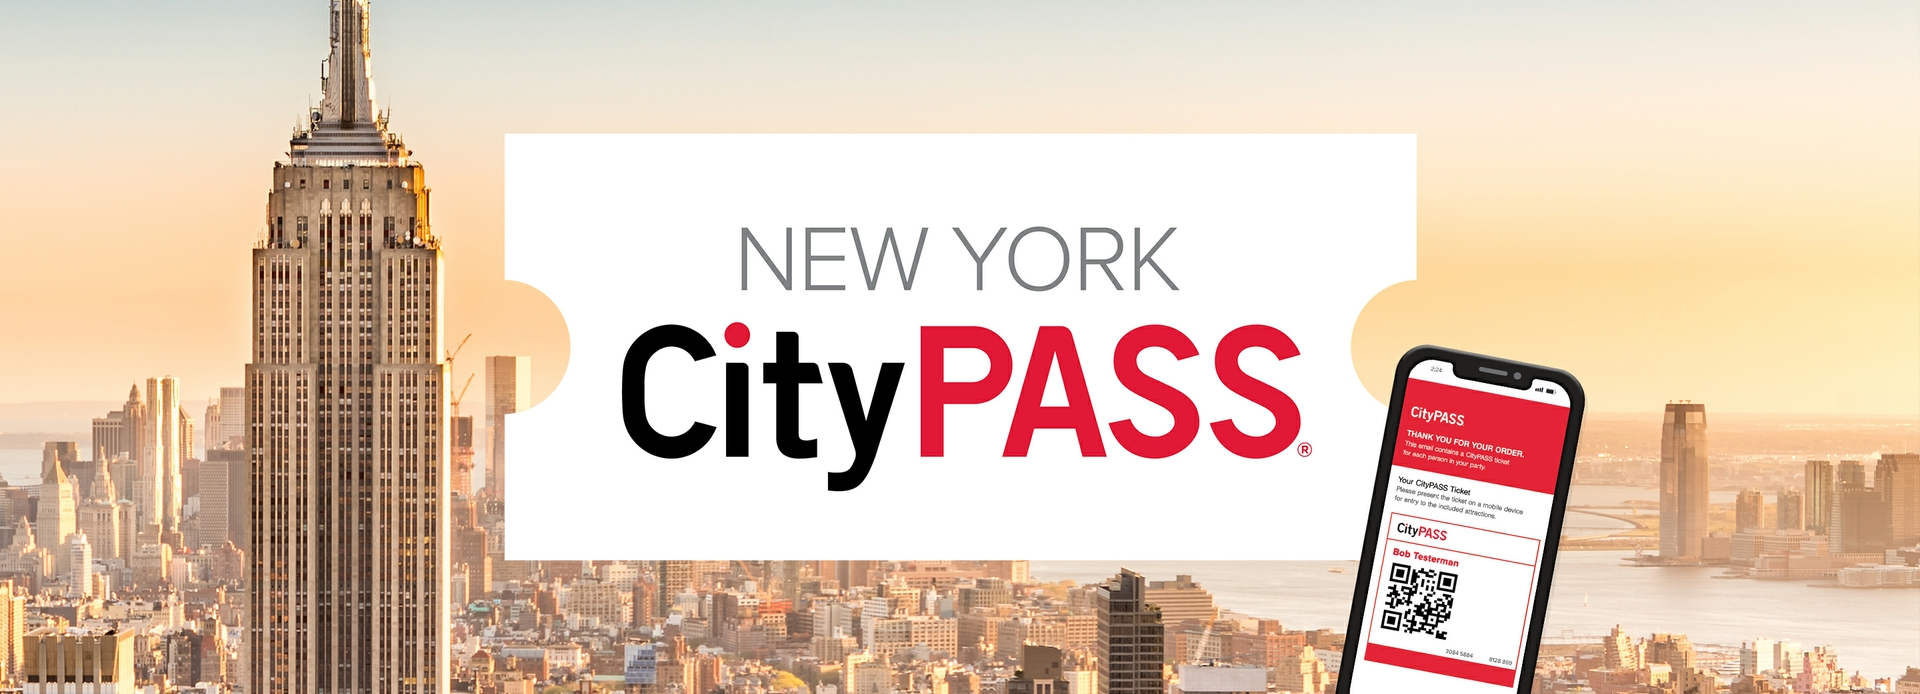 2021- 2022 New York CityPASS®